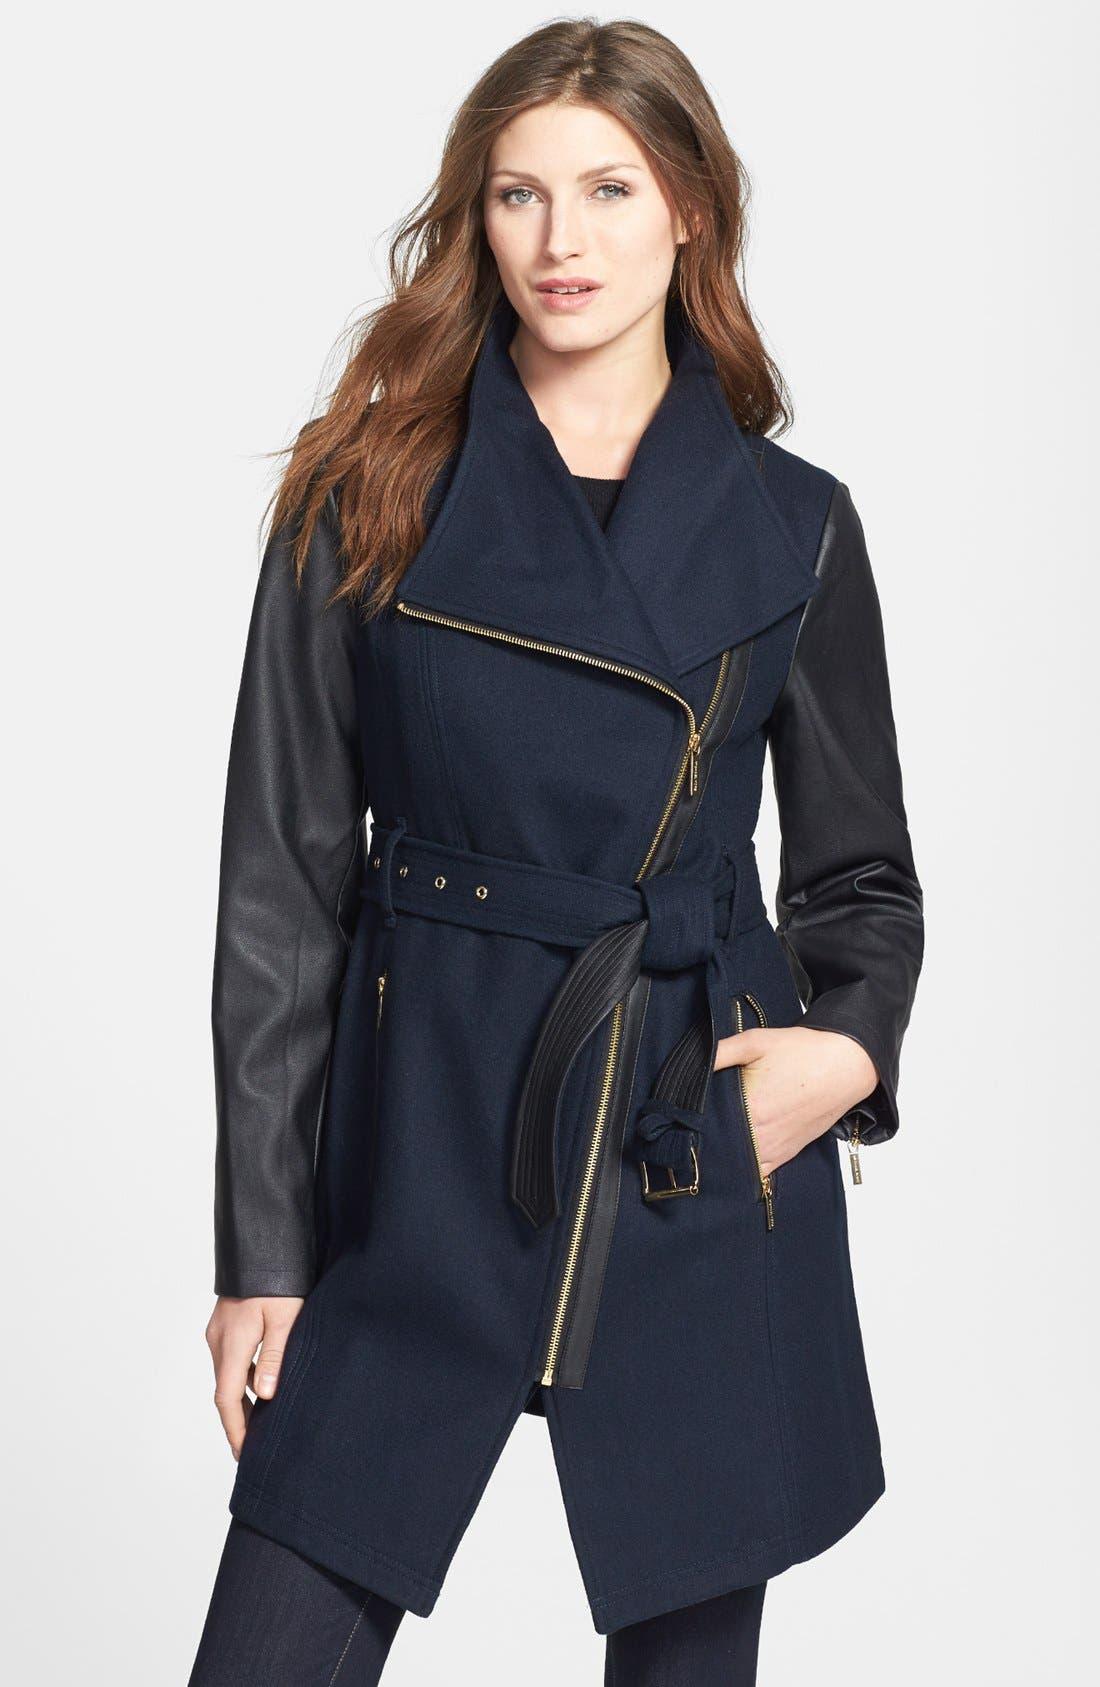 Wool Blend & Faux Leather Coat,                             Main thumbnail 1, color,                             410